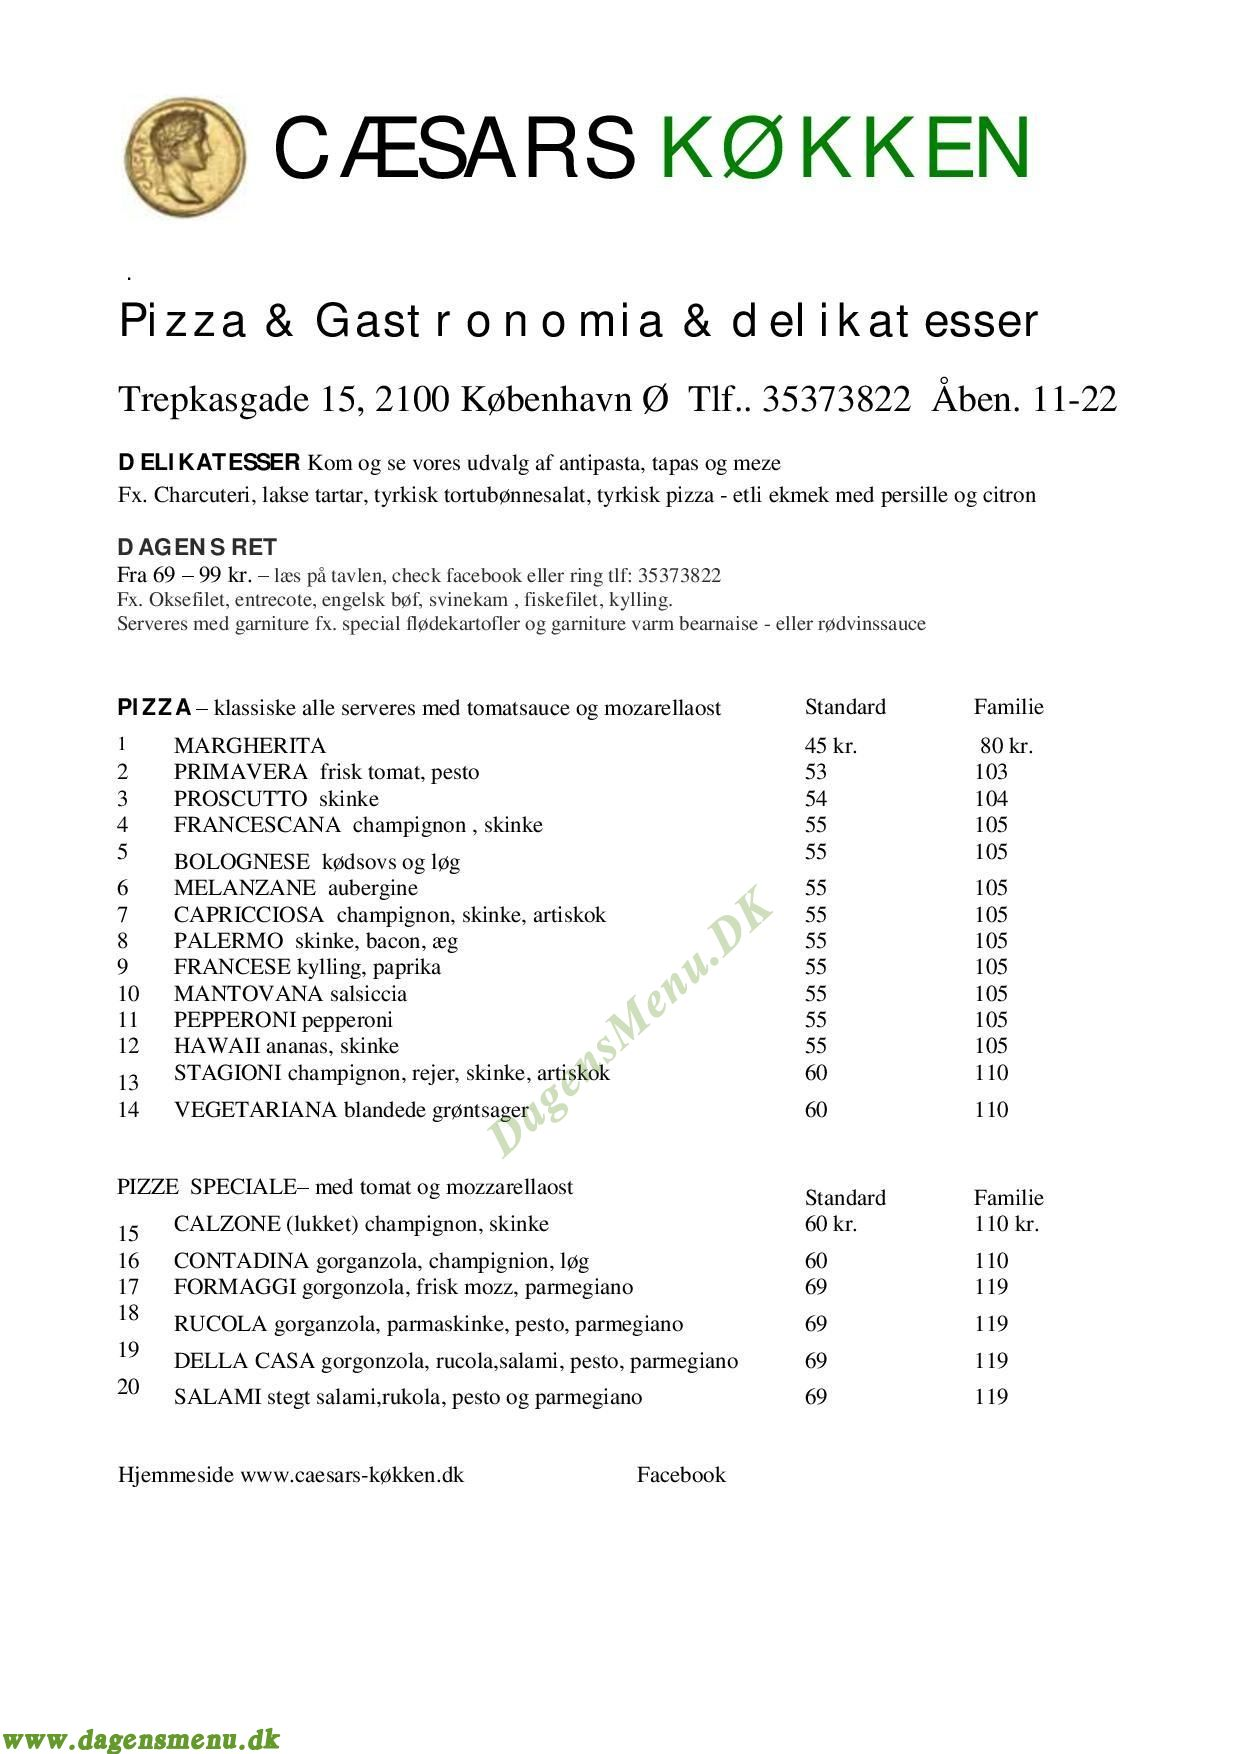 Caesars Køkken - Menukort